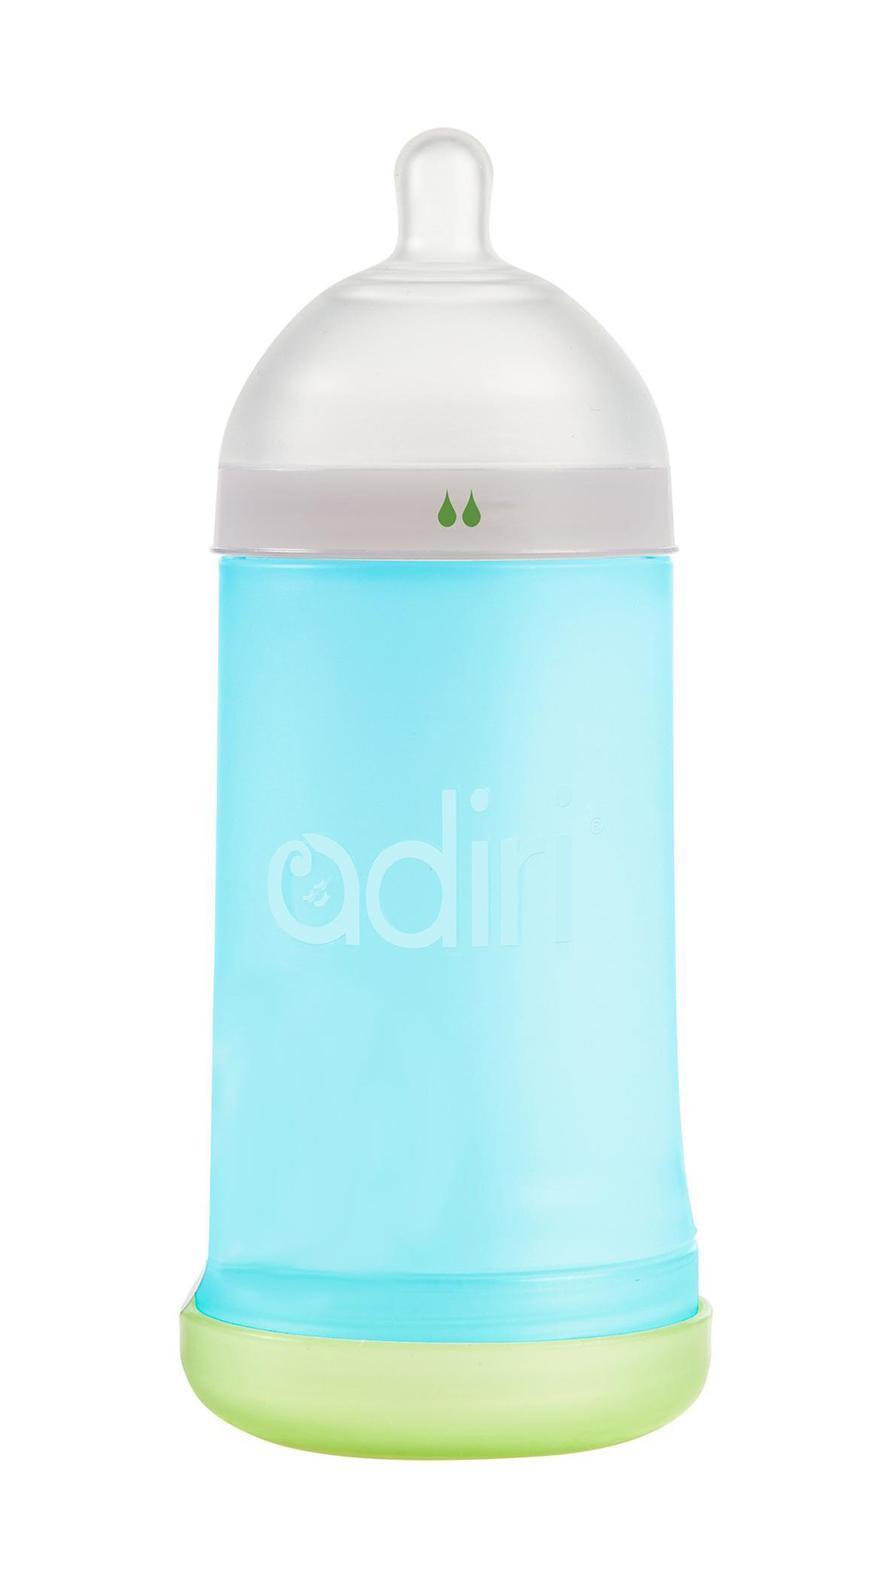 Детская бутылочка Adiri NxGen Slow Flow Blue, 3-6 мес., 281 мл. -  Бутылочки